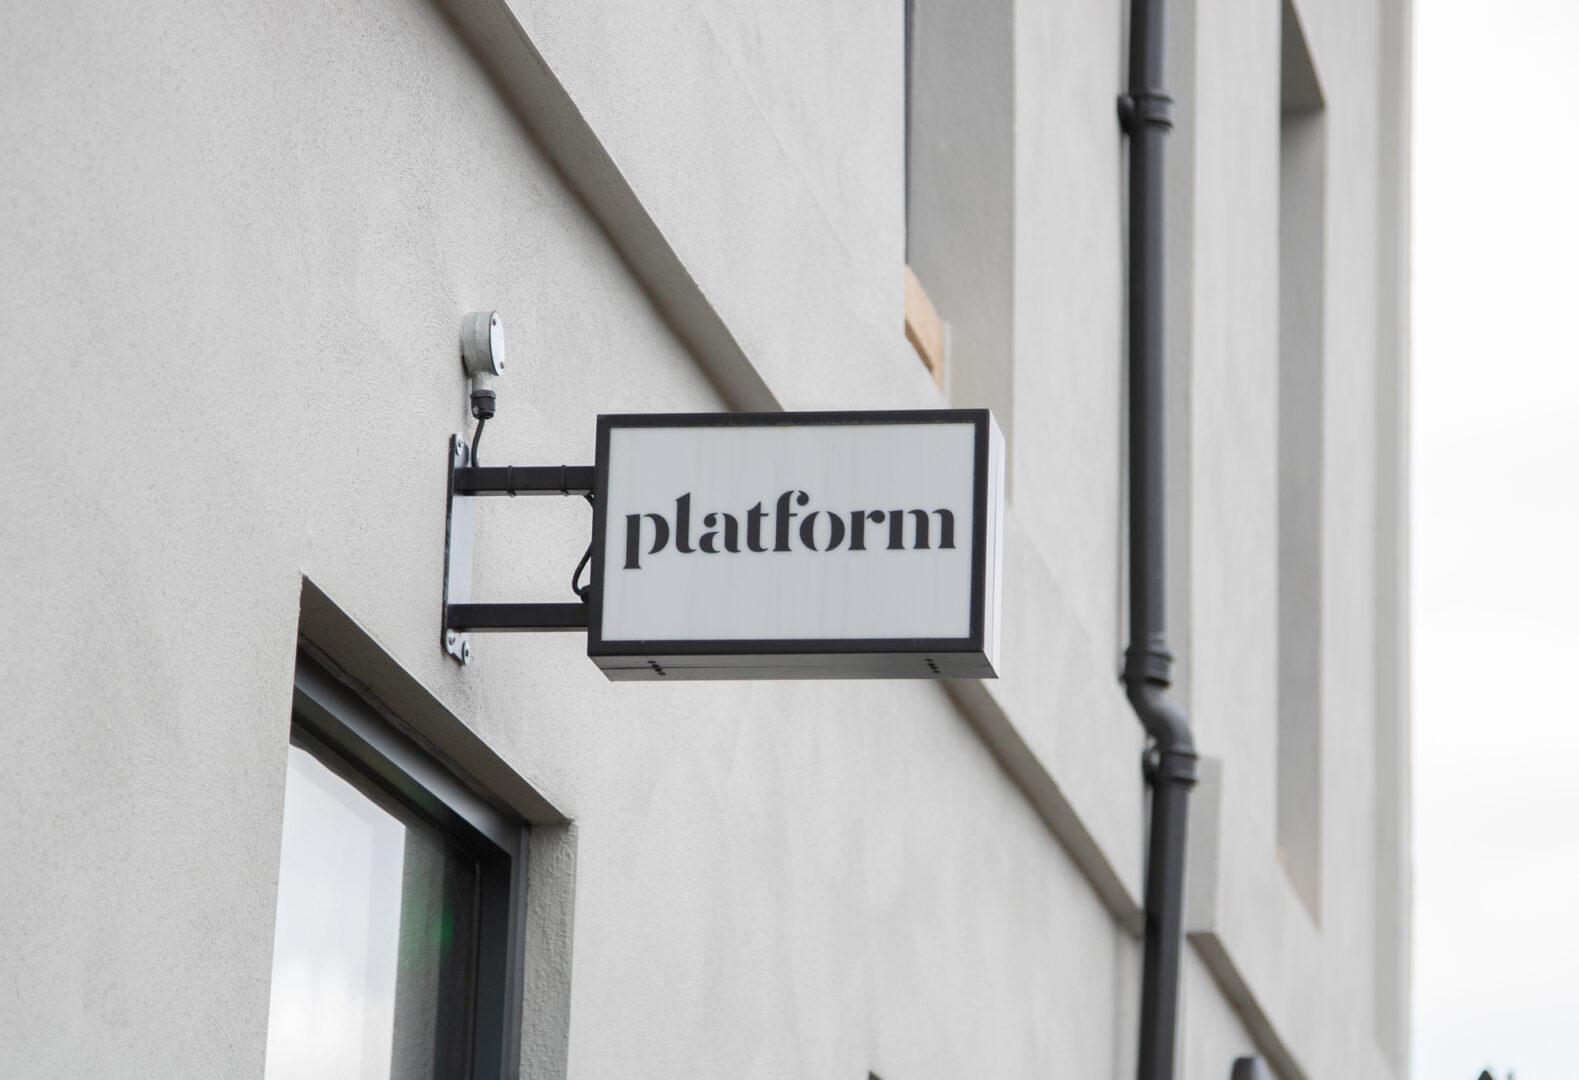 Exciting news - Platform sign